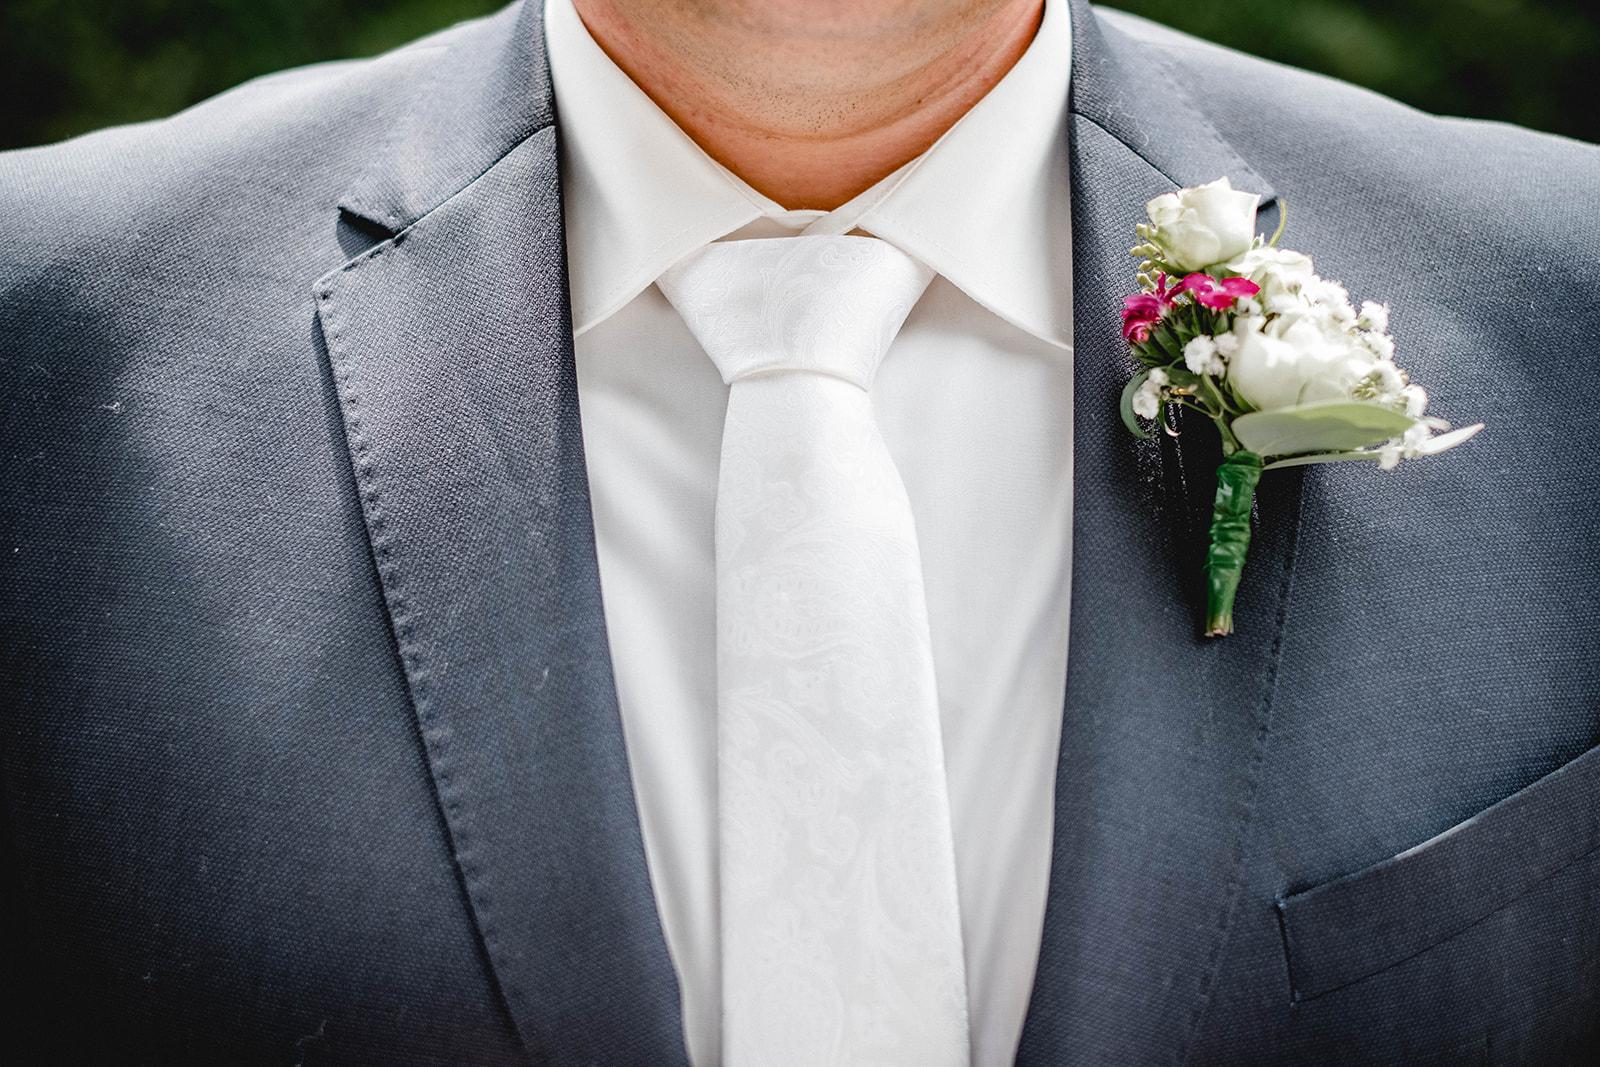 Hochzeit, Wedding, Standesamt, Braut, Bräutigam, Tübingen, Nürtingen, Stuttgart, Begleitung, Hochzeitstag, nürtingen, stuttgart, reutlingen, mittelstadt, esslingen, ringe, deko, strauss, brautpaarshooting, weddingshooting, Wasser, See, Bach, Wald, Bäume, Paar, liebe, kuscheln, tanzen